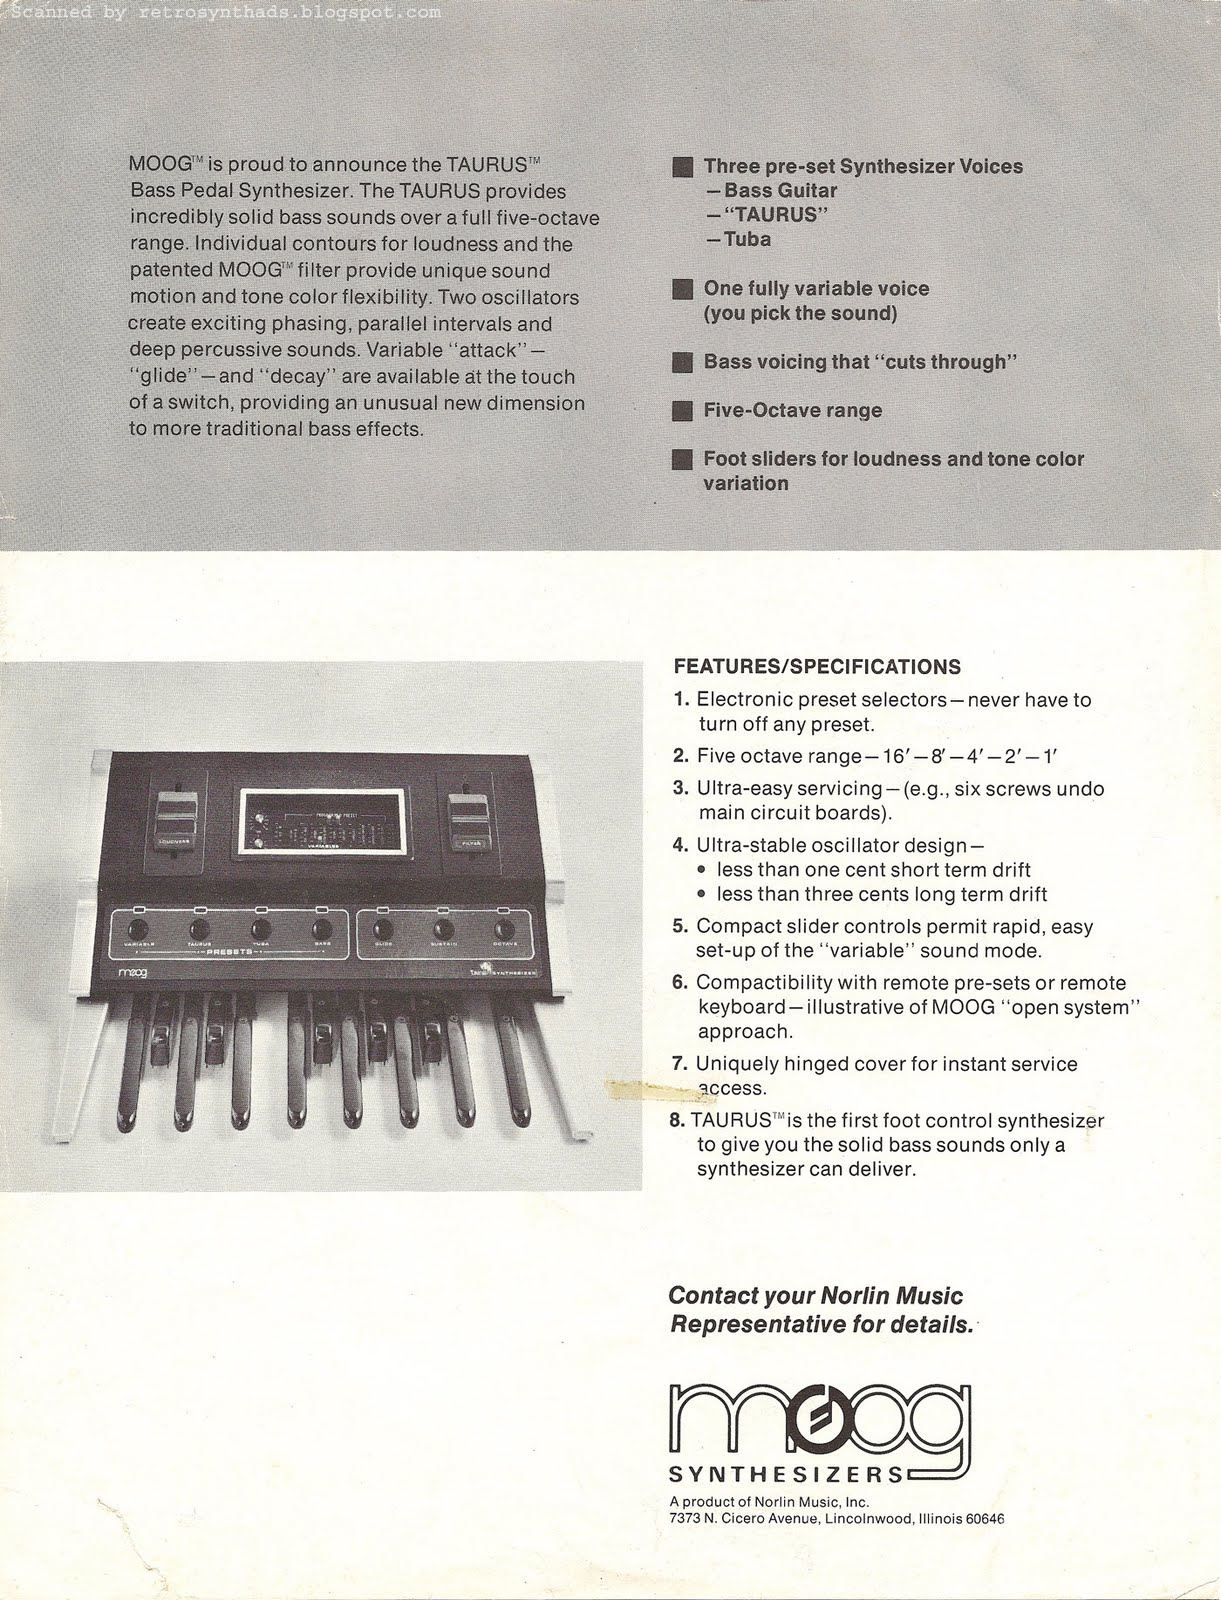 moog_taurus_broch_74_back retro synth ads moog taurus bass pedal synthesizer (aka taurus 1 2008 Taurus Wiring Diagram at n-0.co